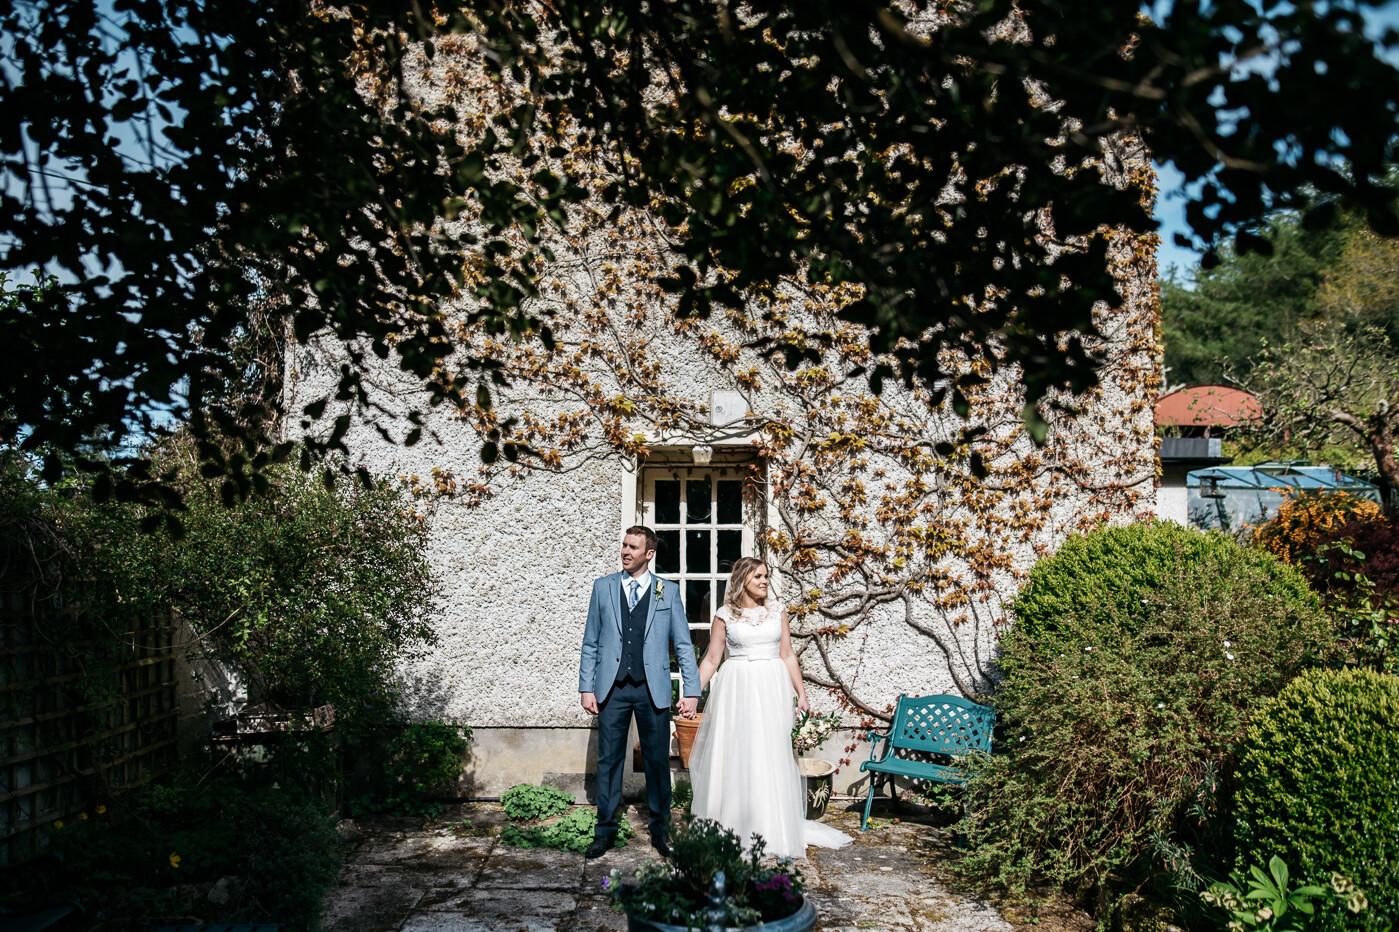 Wedding Photographers Ireland 23 06 2021 10